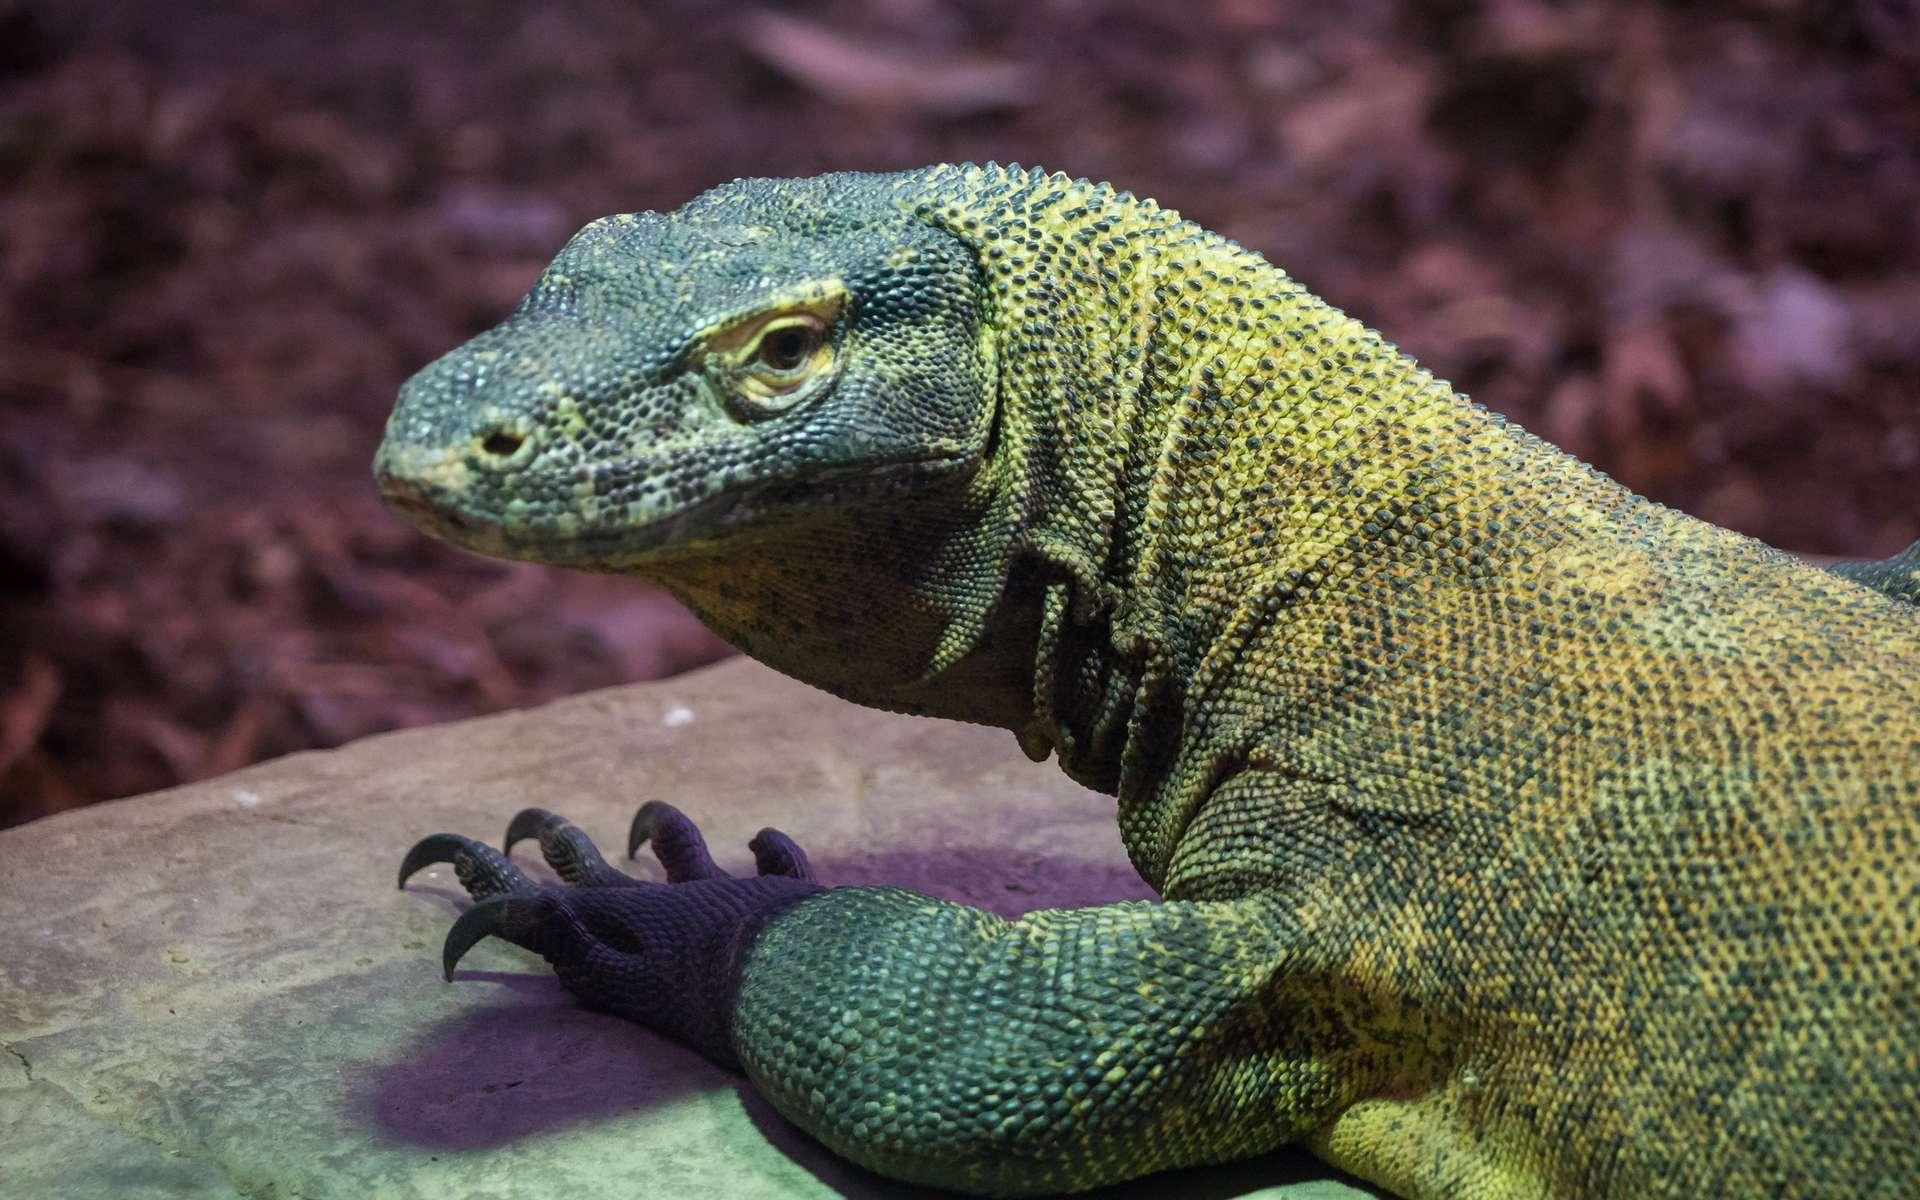 Le dragon de Komodo, un des plus grands sauriens actuels. © Rob Osborne, Flickr